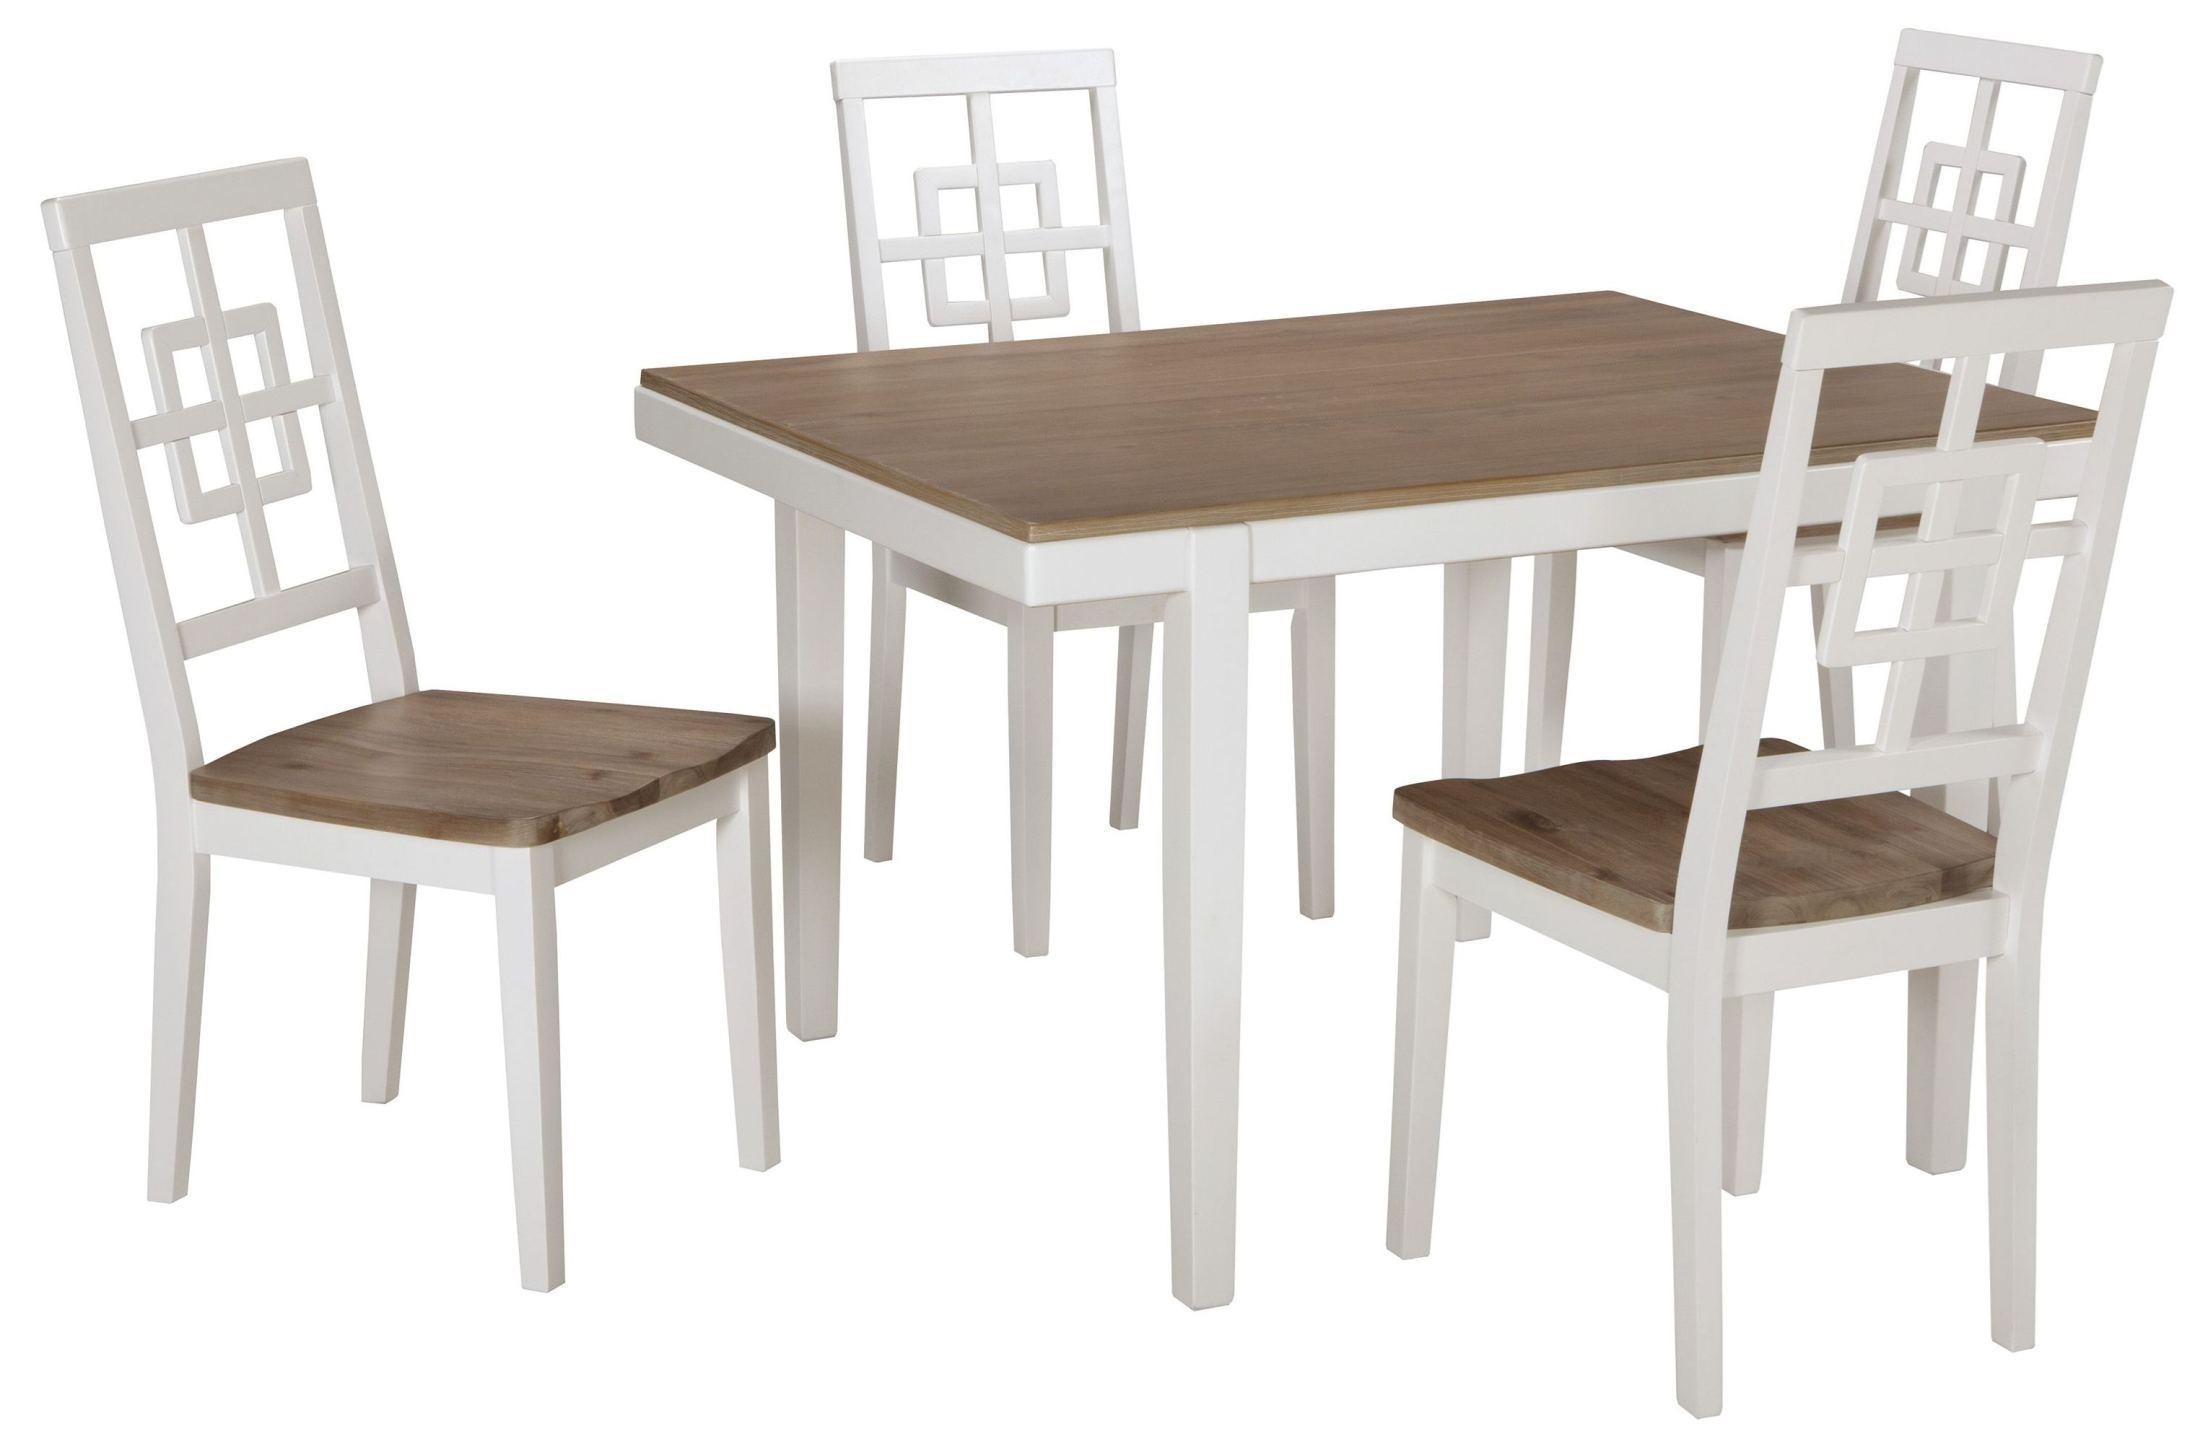 brovada two tone rectangular dining room set d298 225 ashley. Black Bedroom Furniture Sets. Home Design Ideas